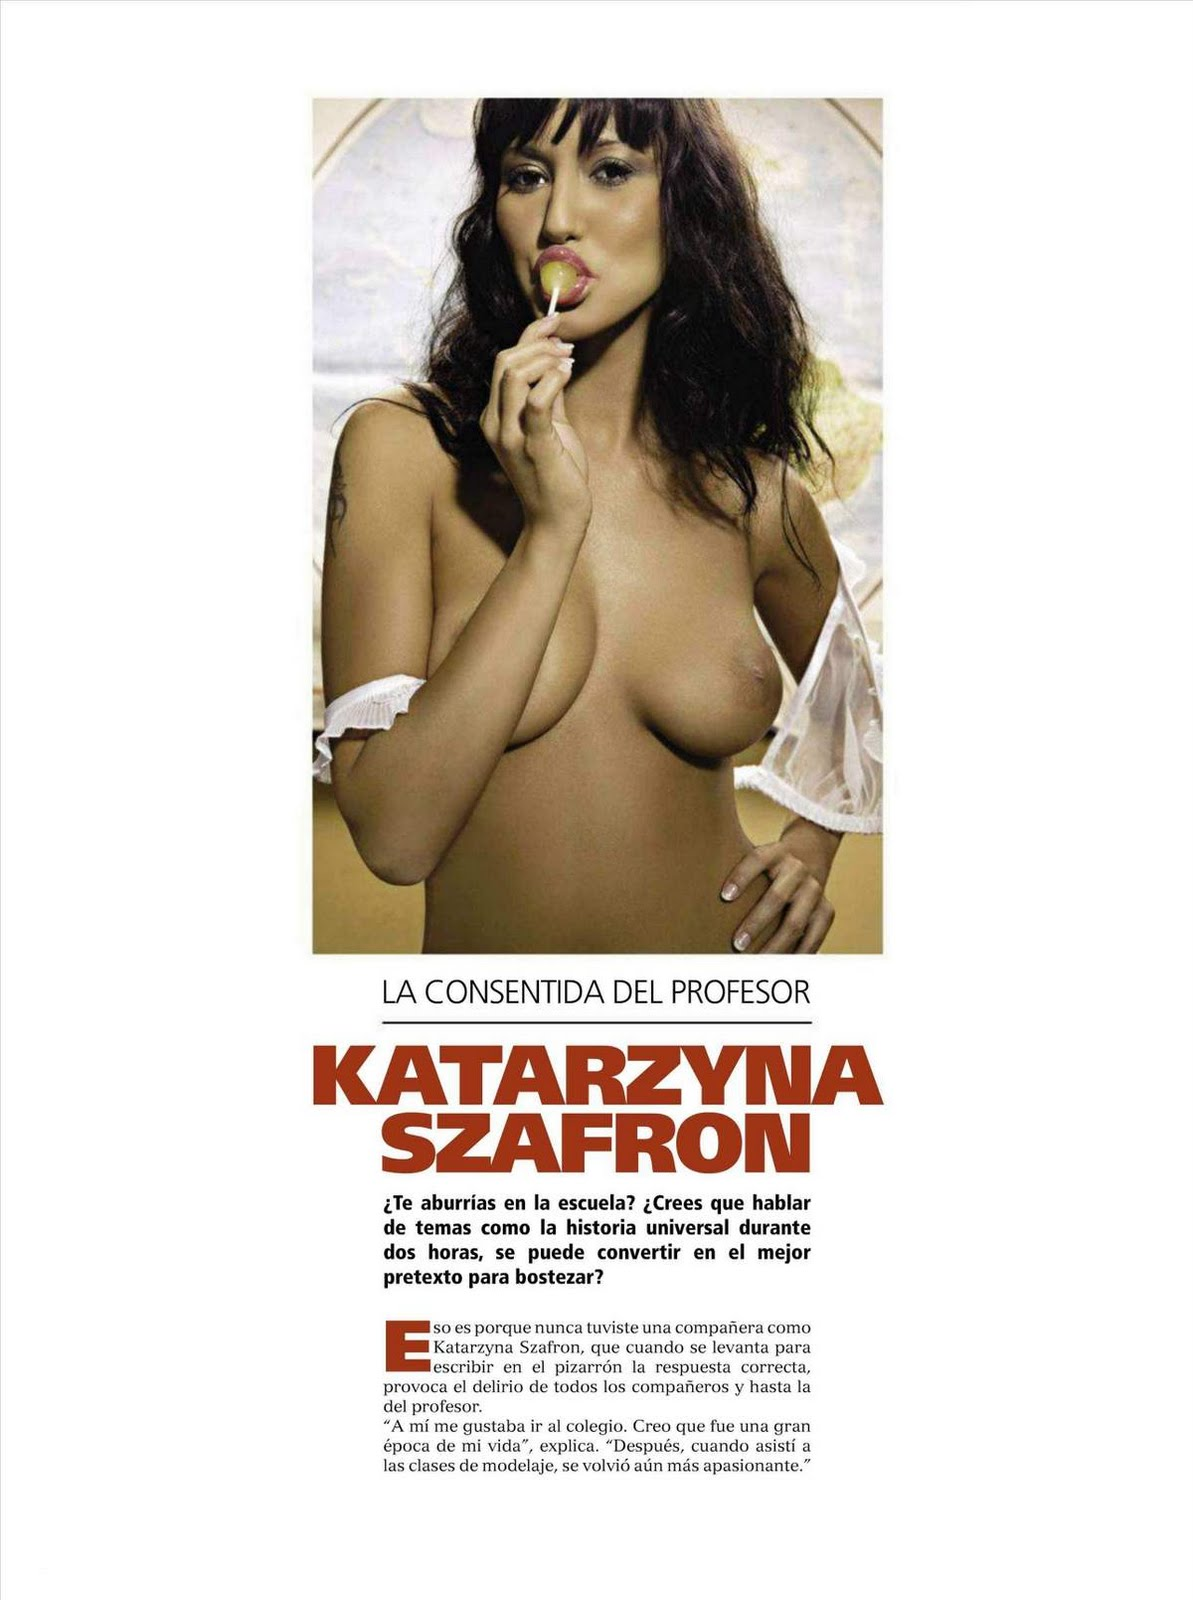 Szafron  nackt Katarzyna Katarzyna Szafron